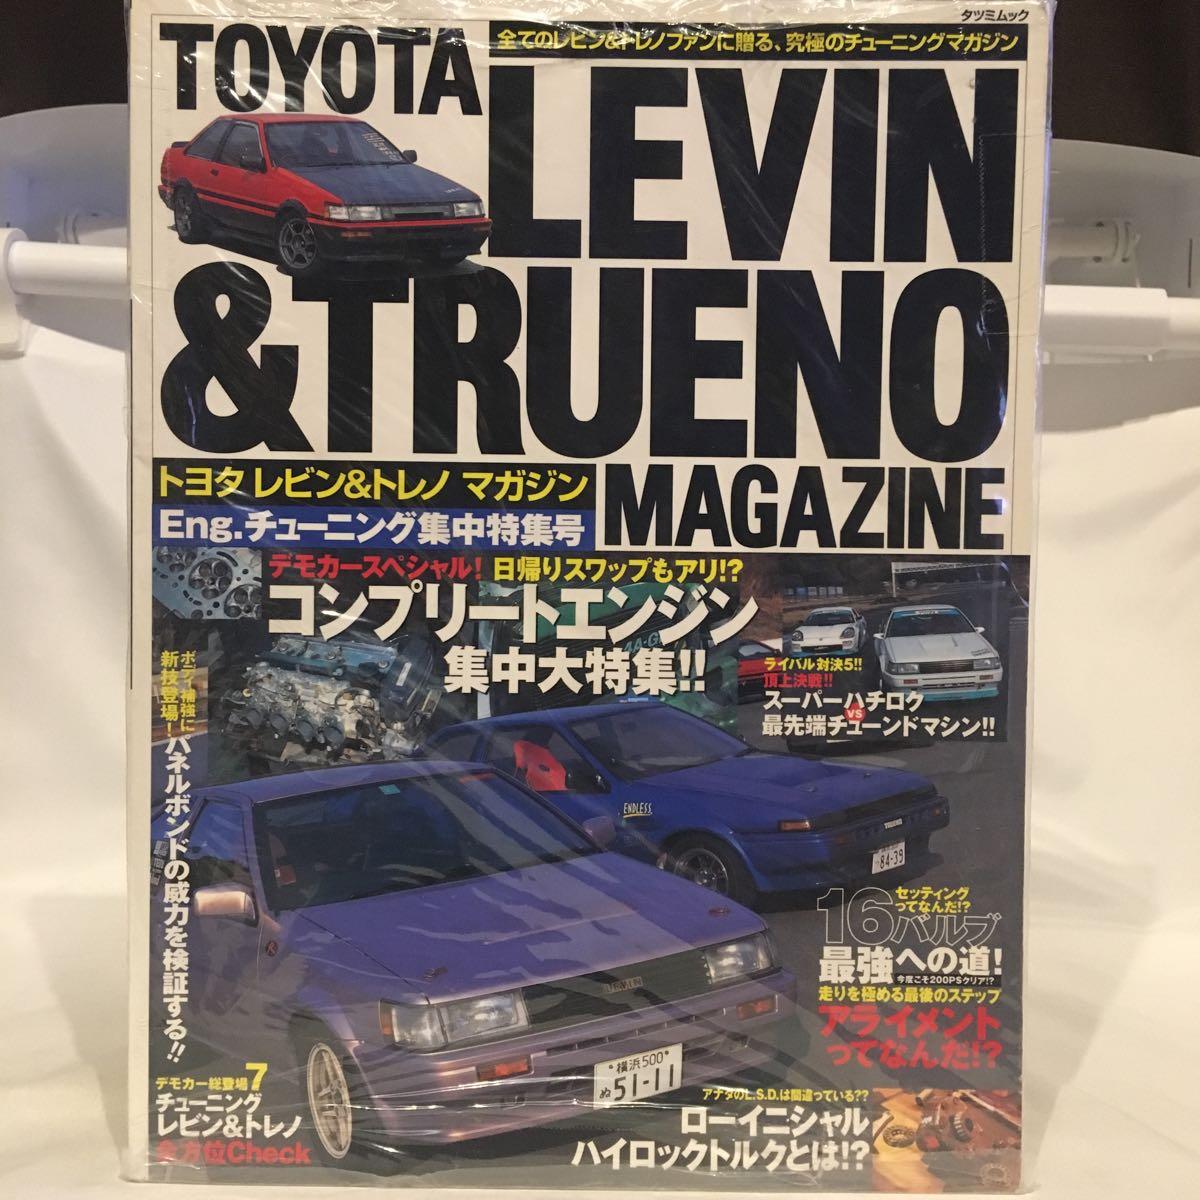 TOYOTA LEVIN&TRUENO MAGAZINE vol.7 トヨタ トレノ レビン マガジン AE86 チューニング メンテナンス 整備 本 4A-GEU ハチロク 旧車_画像1